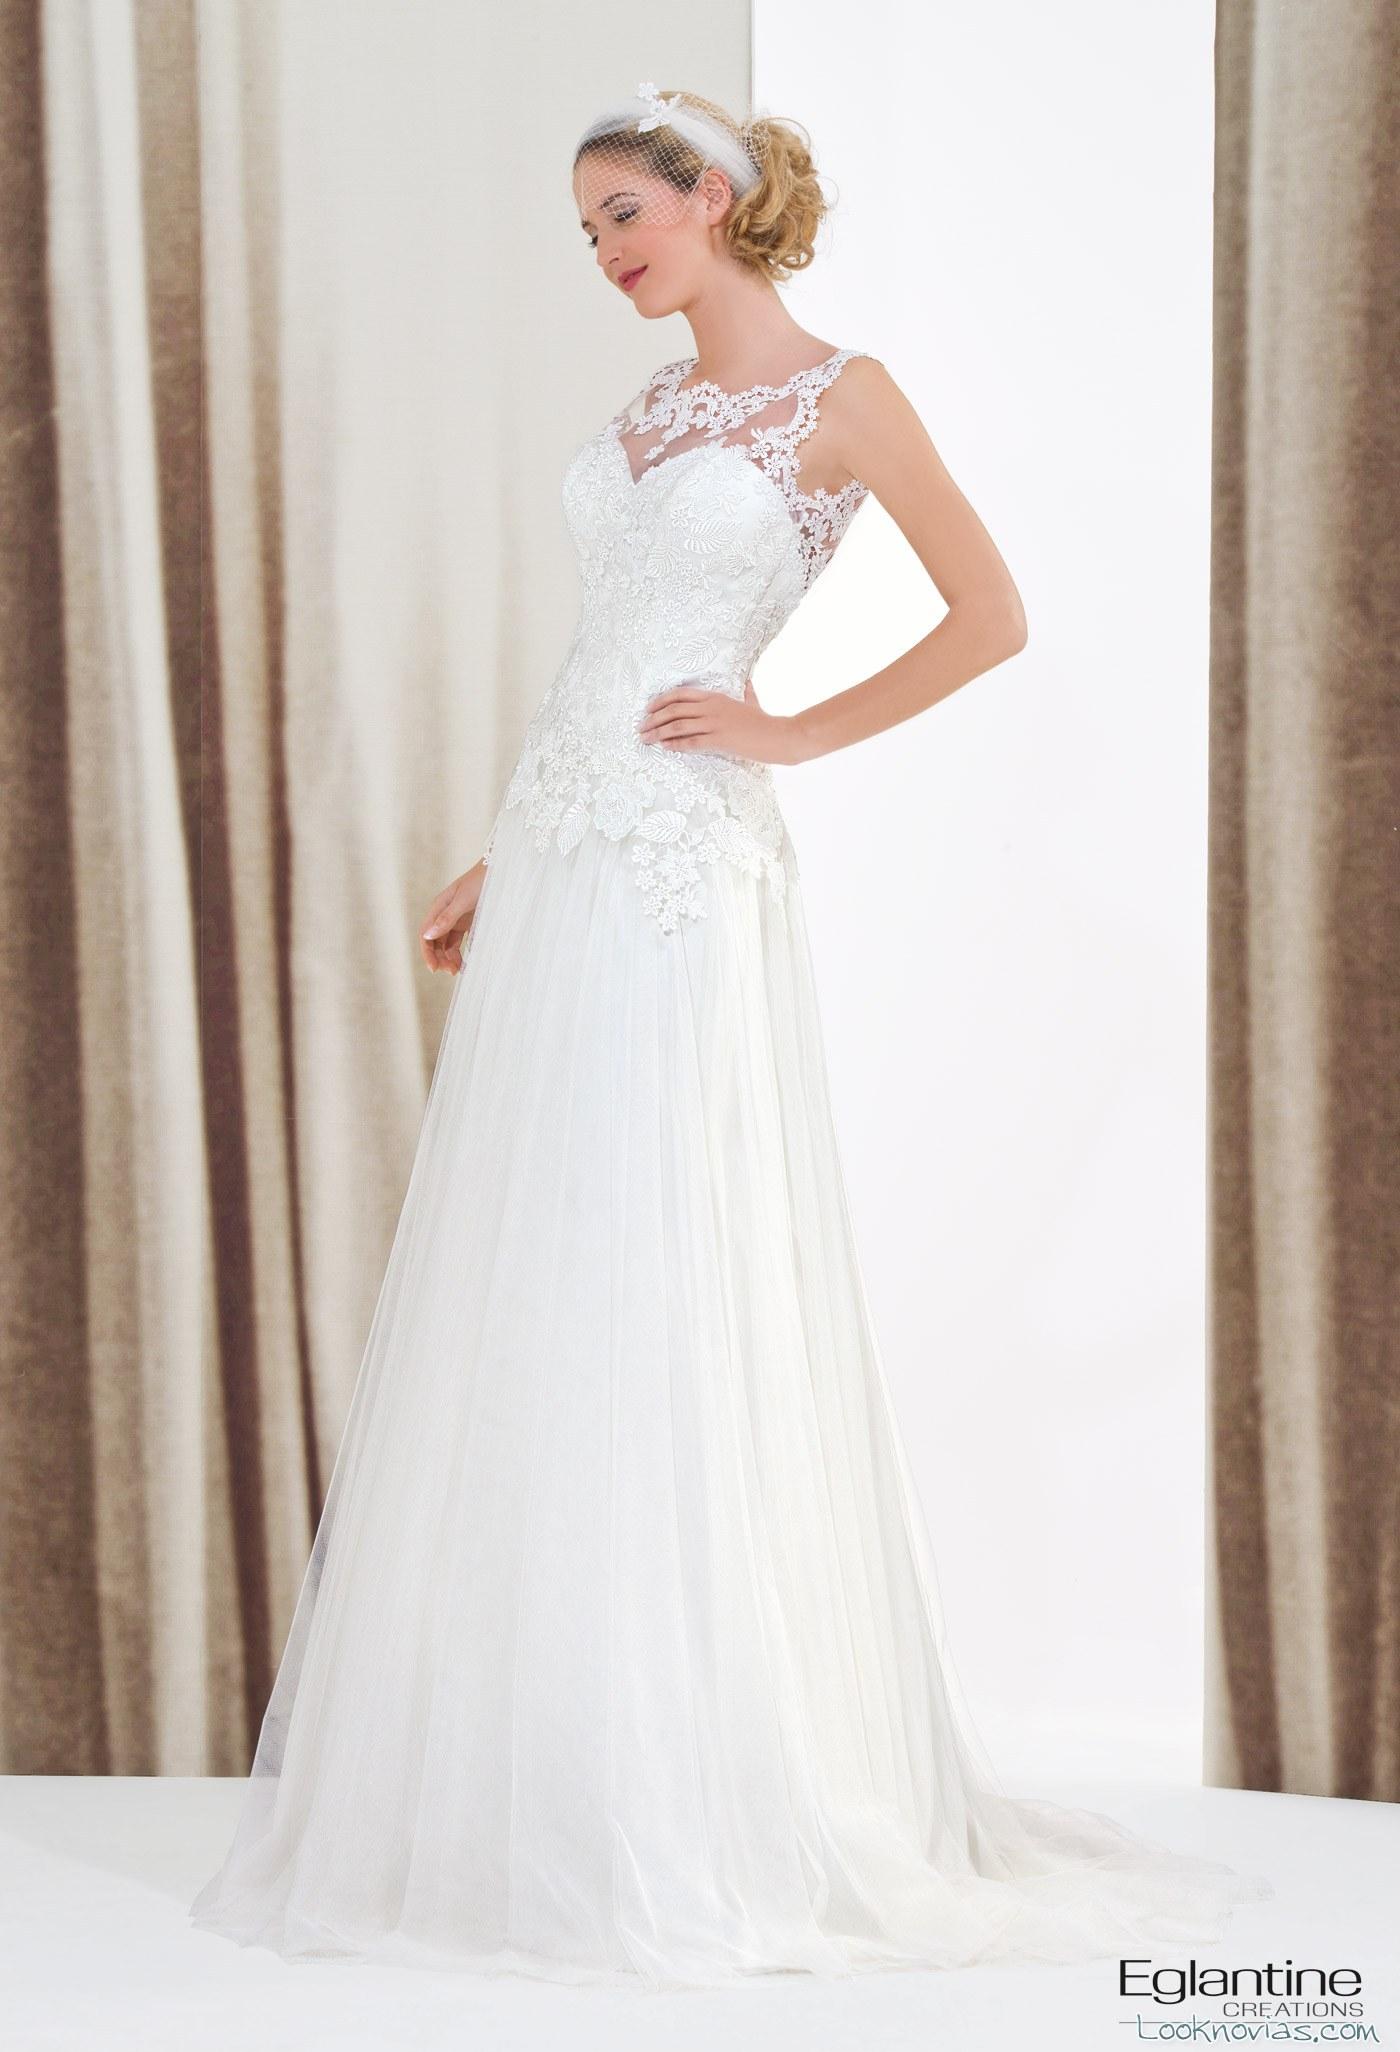 Vestido de novia recto con encajes eglantine